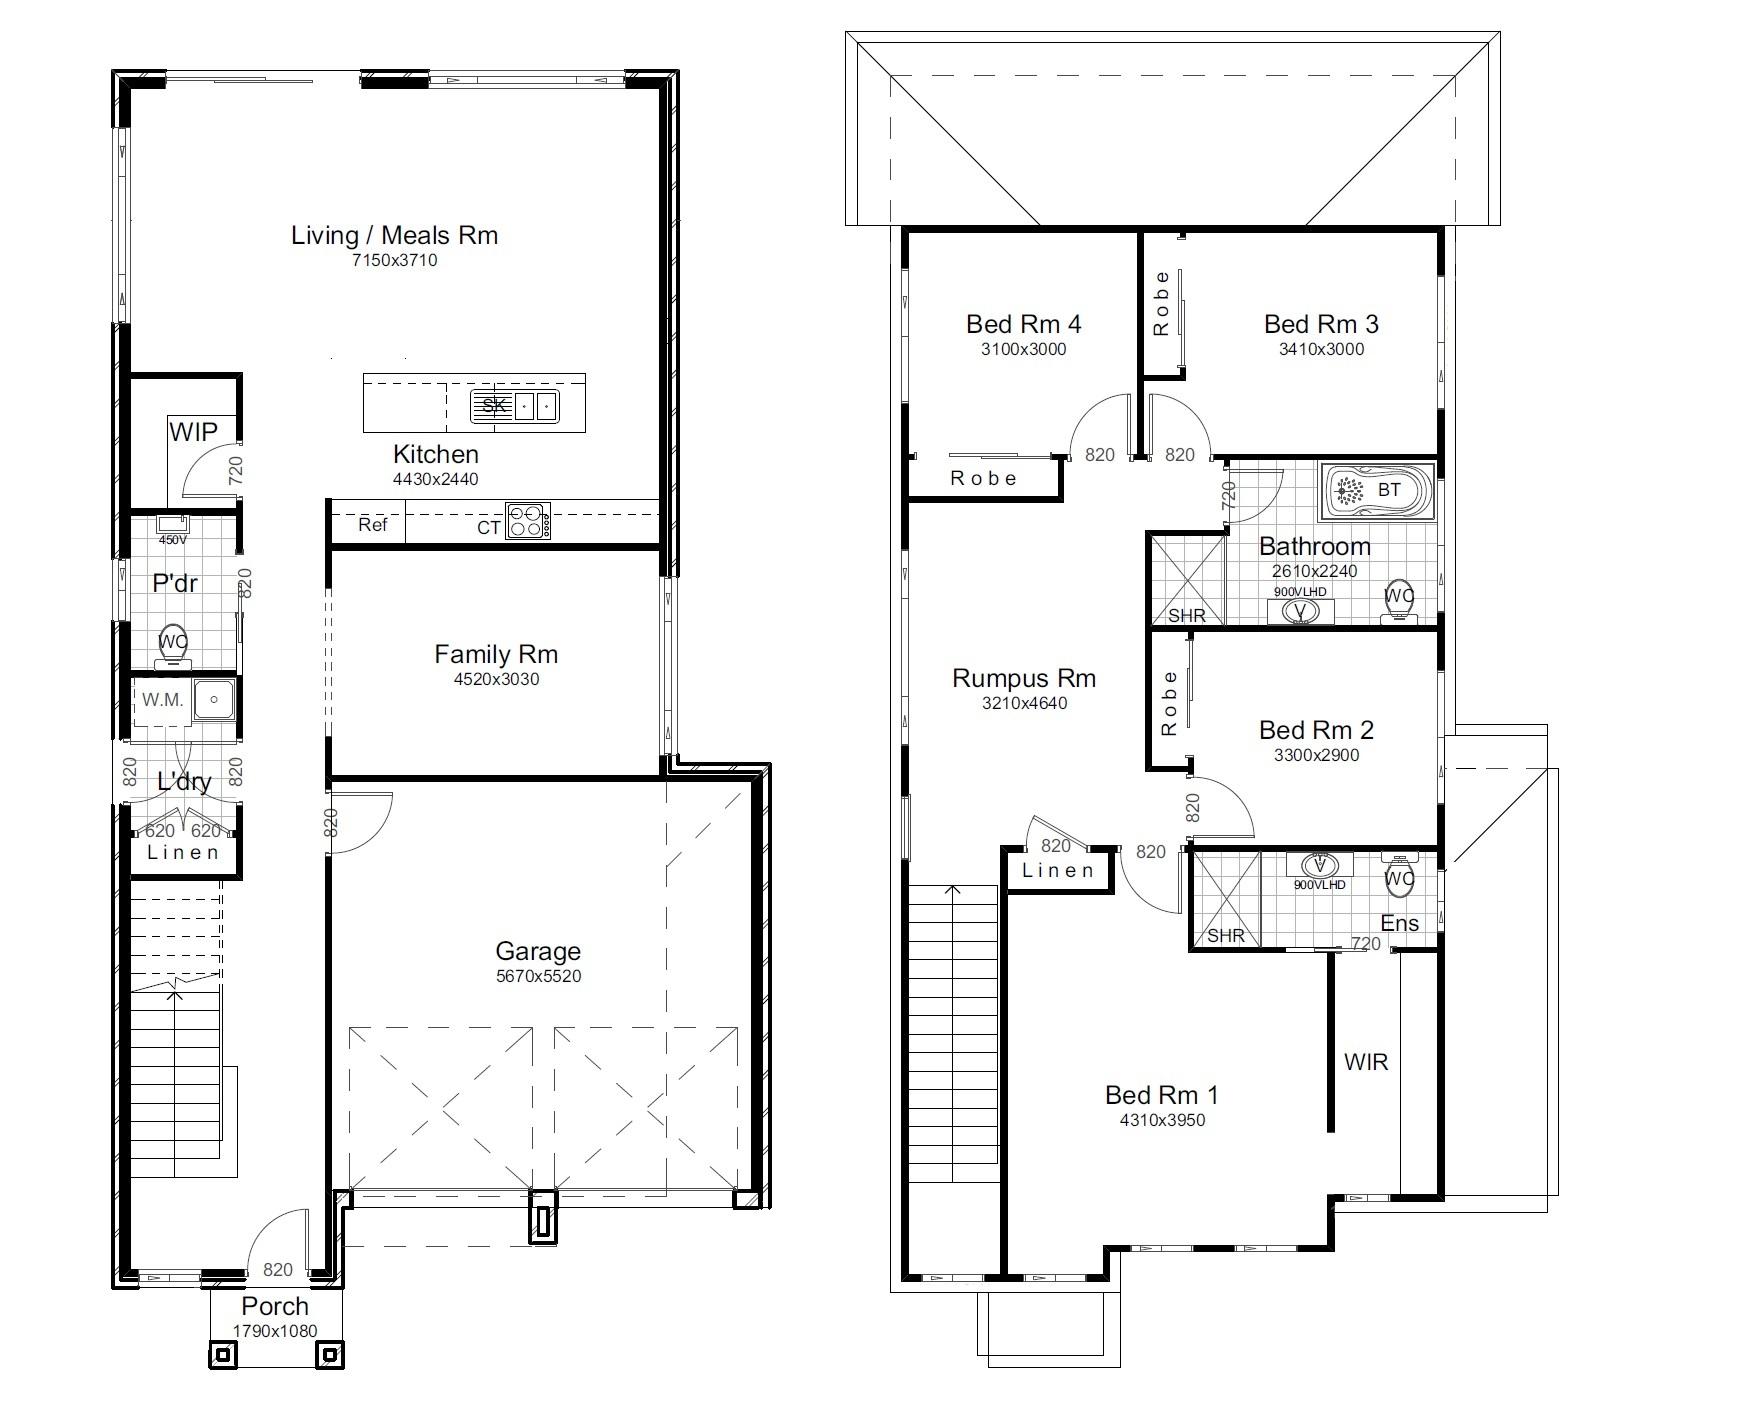 L11390546 AUSTRAL NSW 2179 - Floor plan